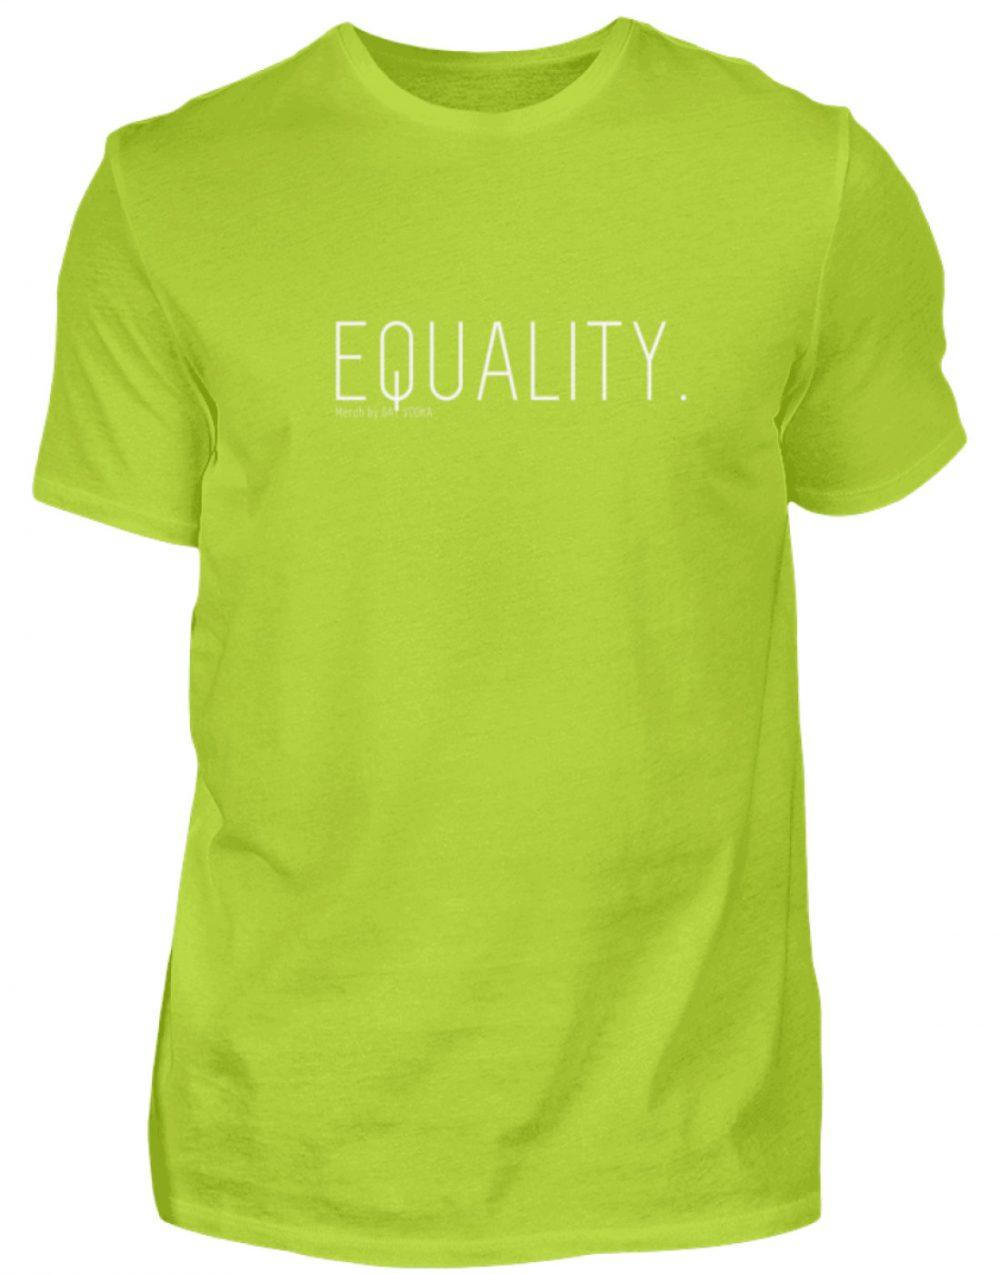 EQUALITY. - Herren Premiumshirt-2885